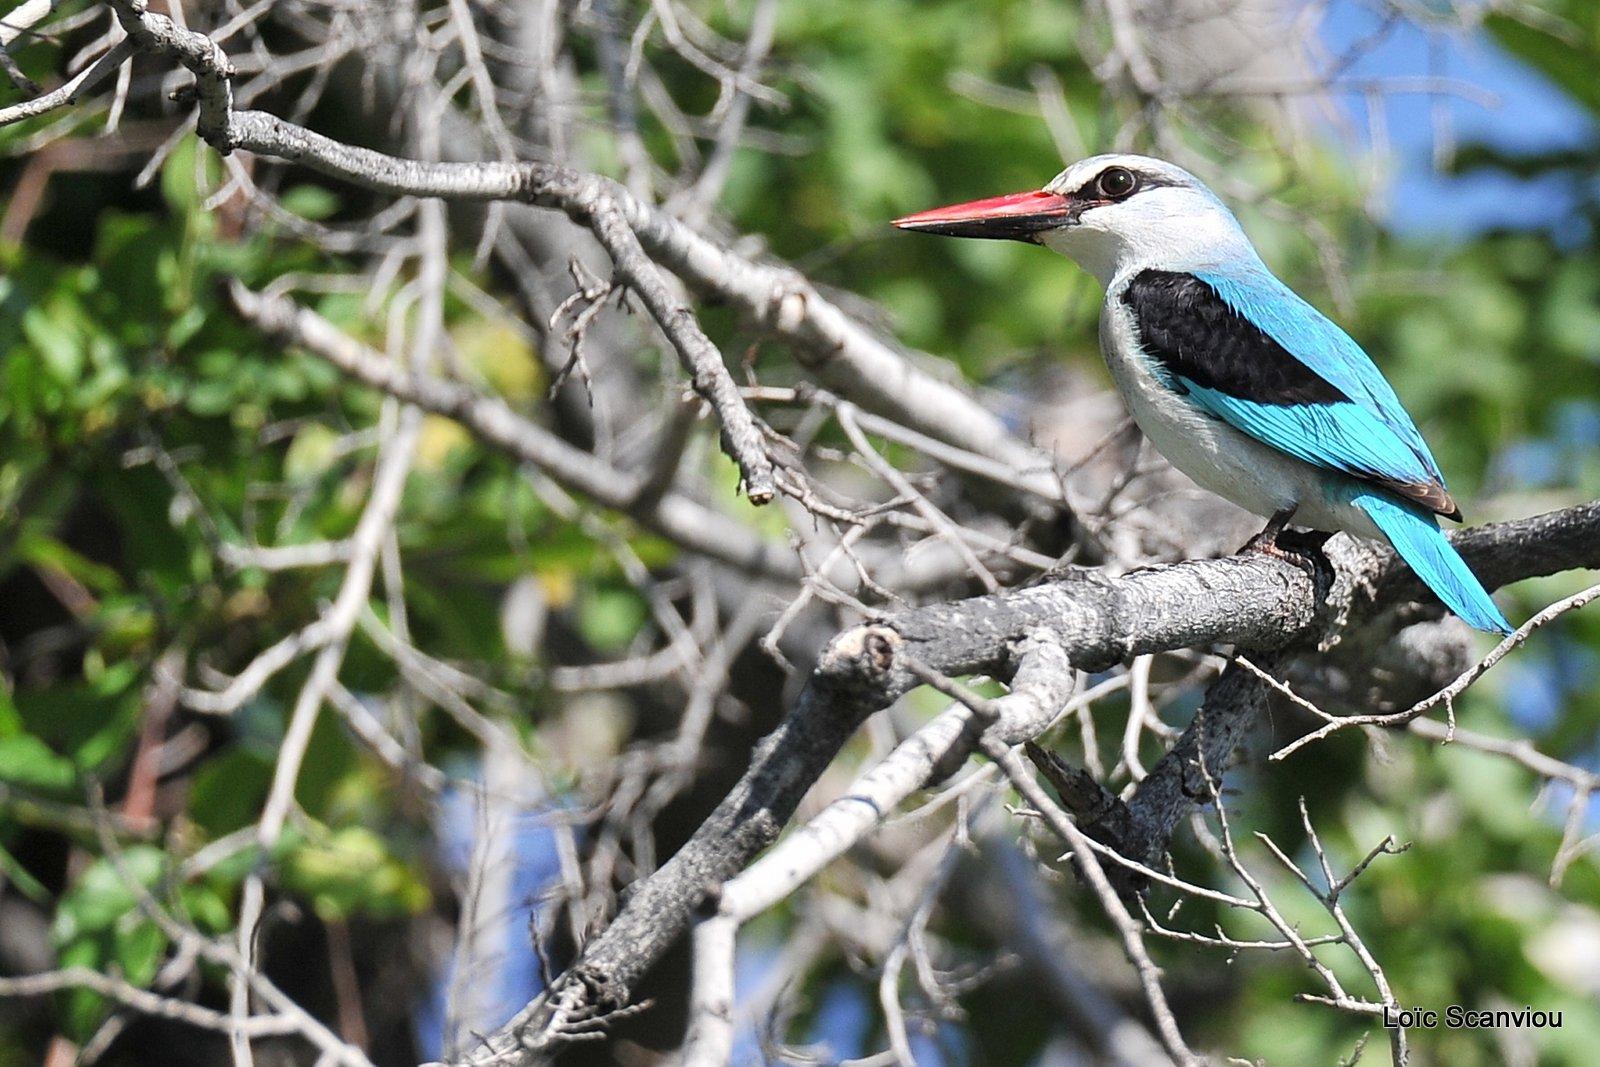 Martin-chasseur du Sénégal/Woodland Kingfisher (2)